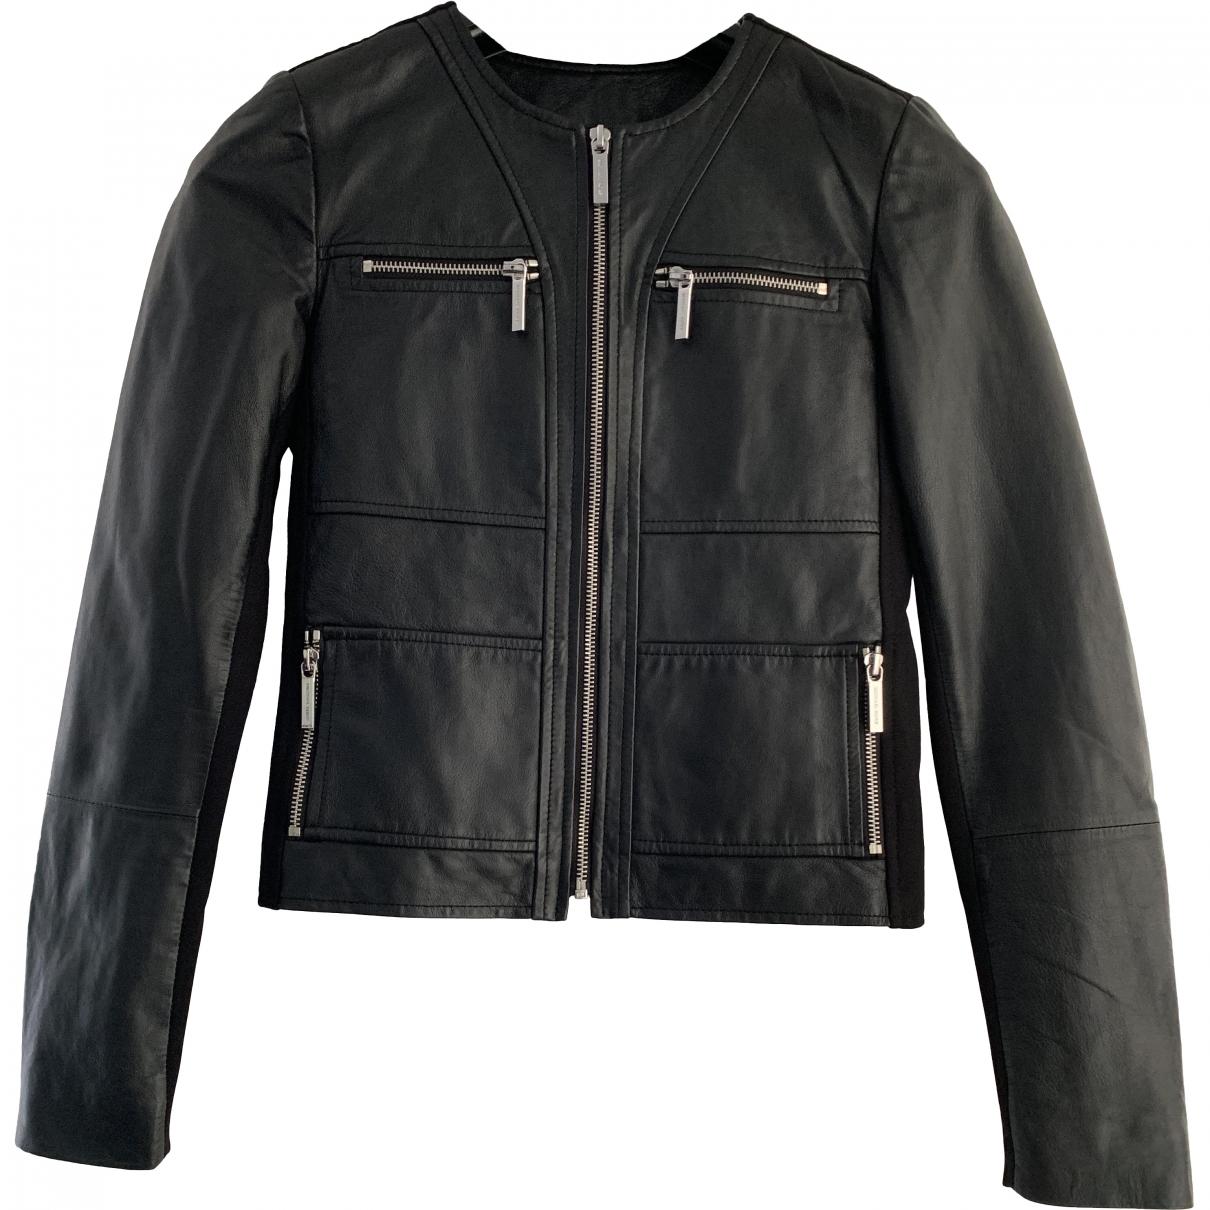 Michael Kors \N Black Leather jacket for Women XS International